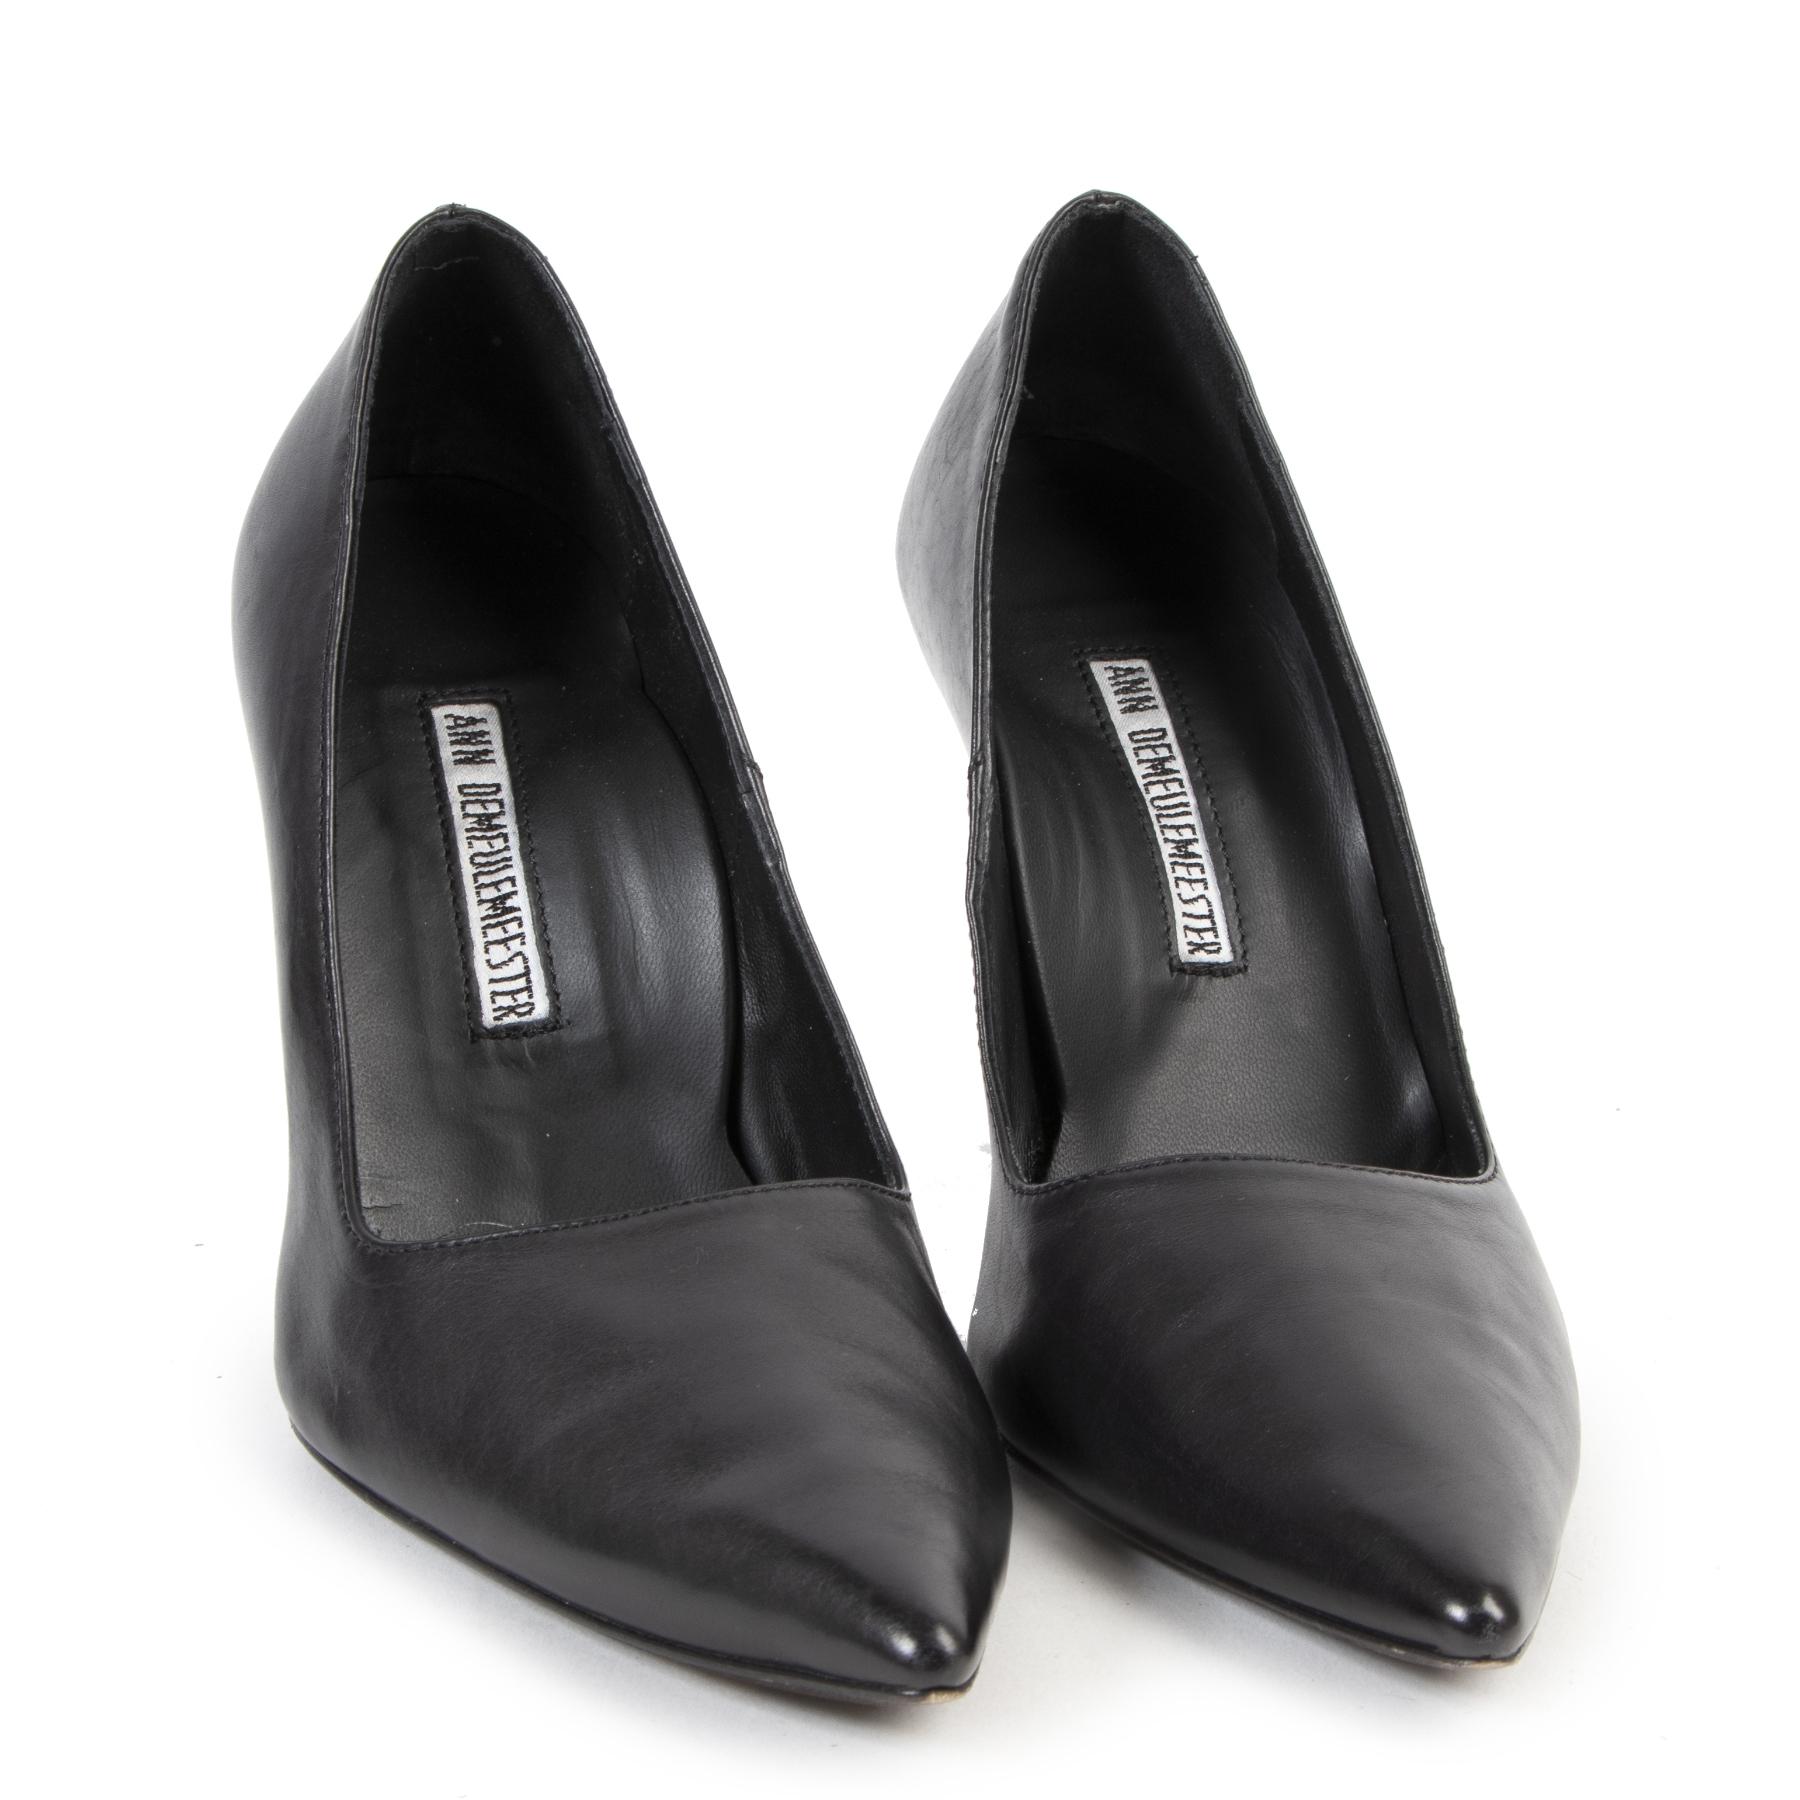 Ann Demeulemeester Black Leather Heels